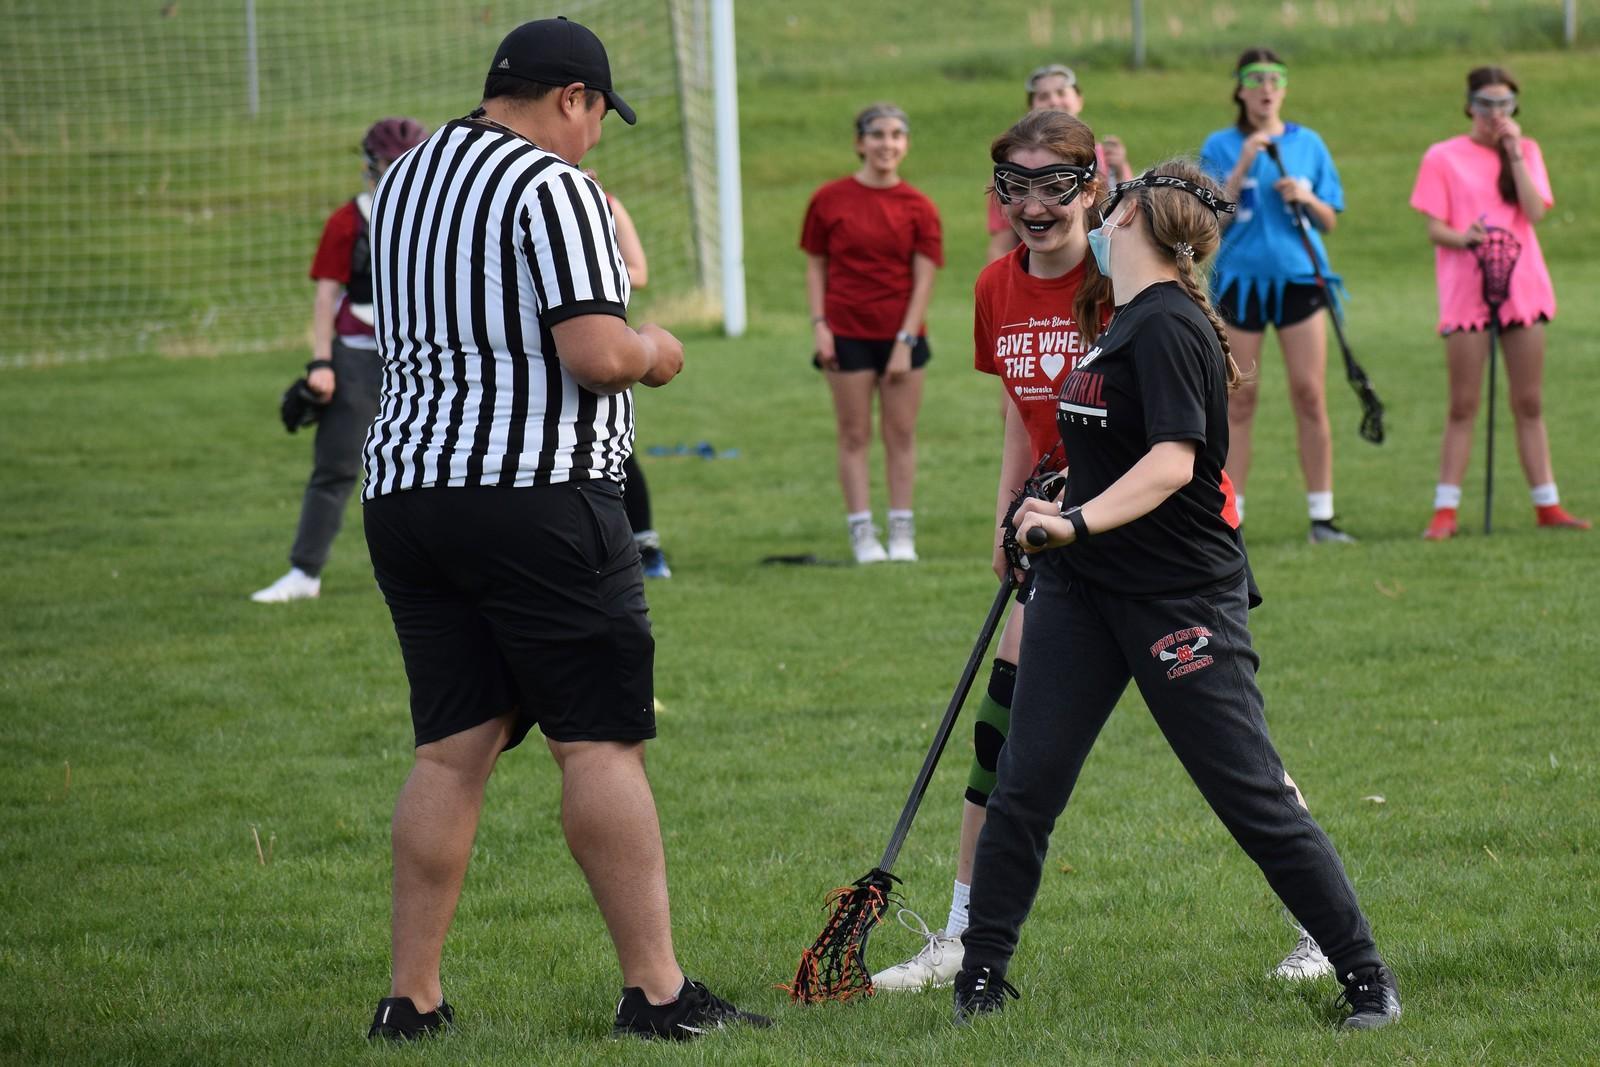 Varsity vs. Alumni/Coaches (05/10/21)